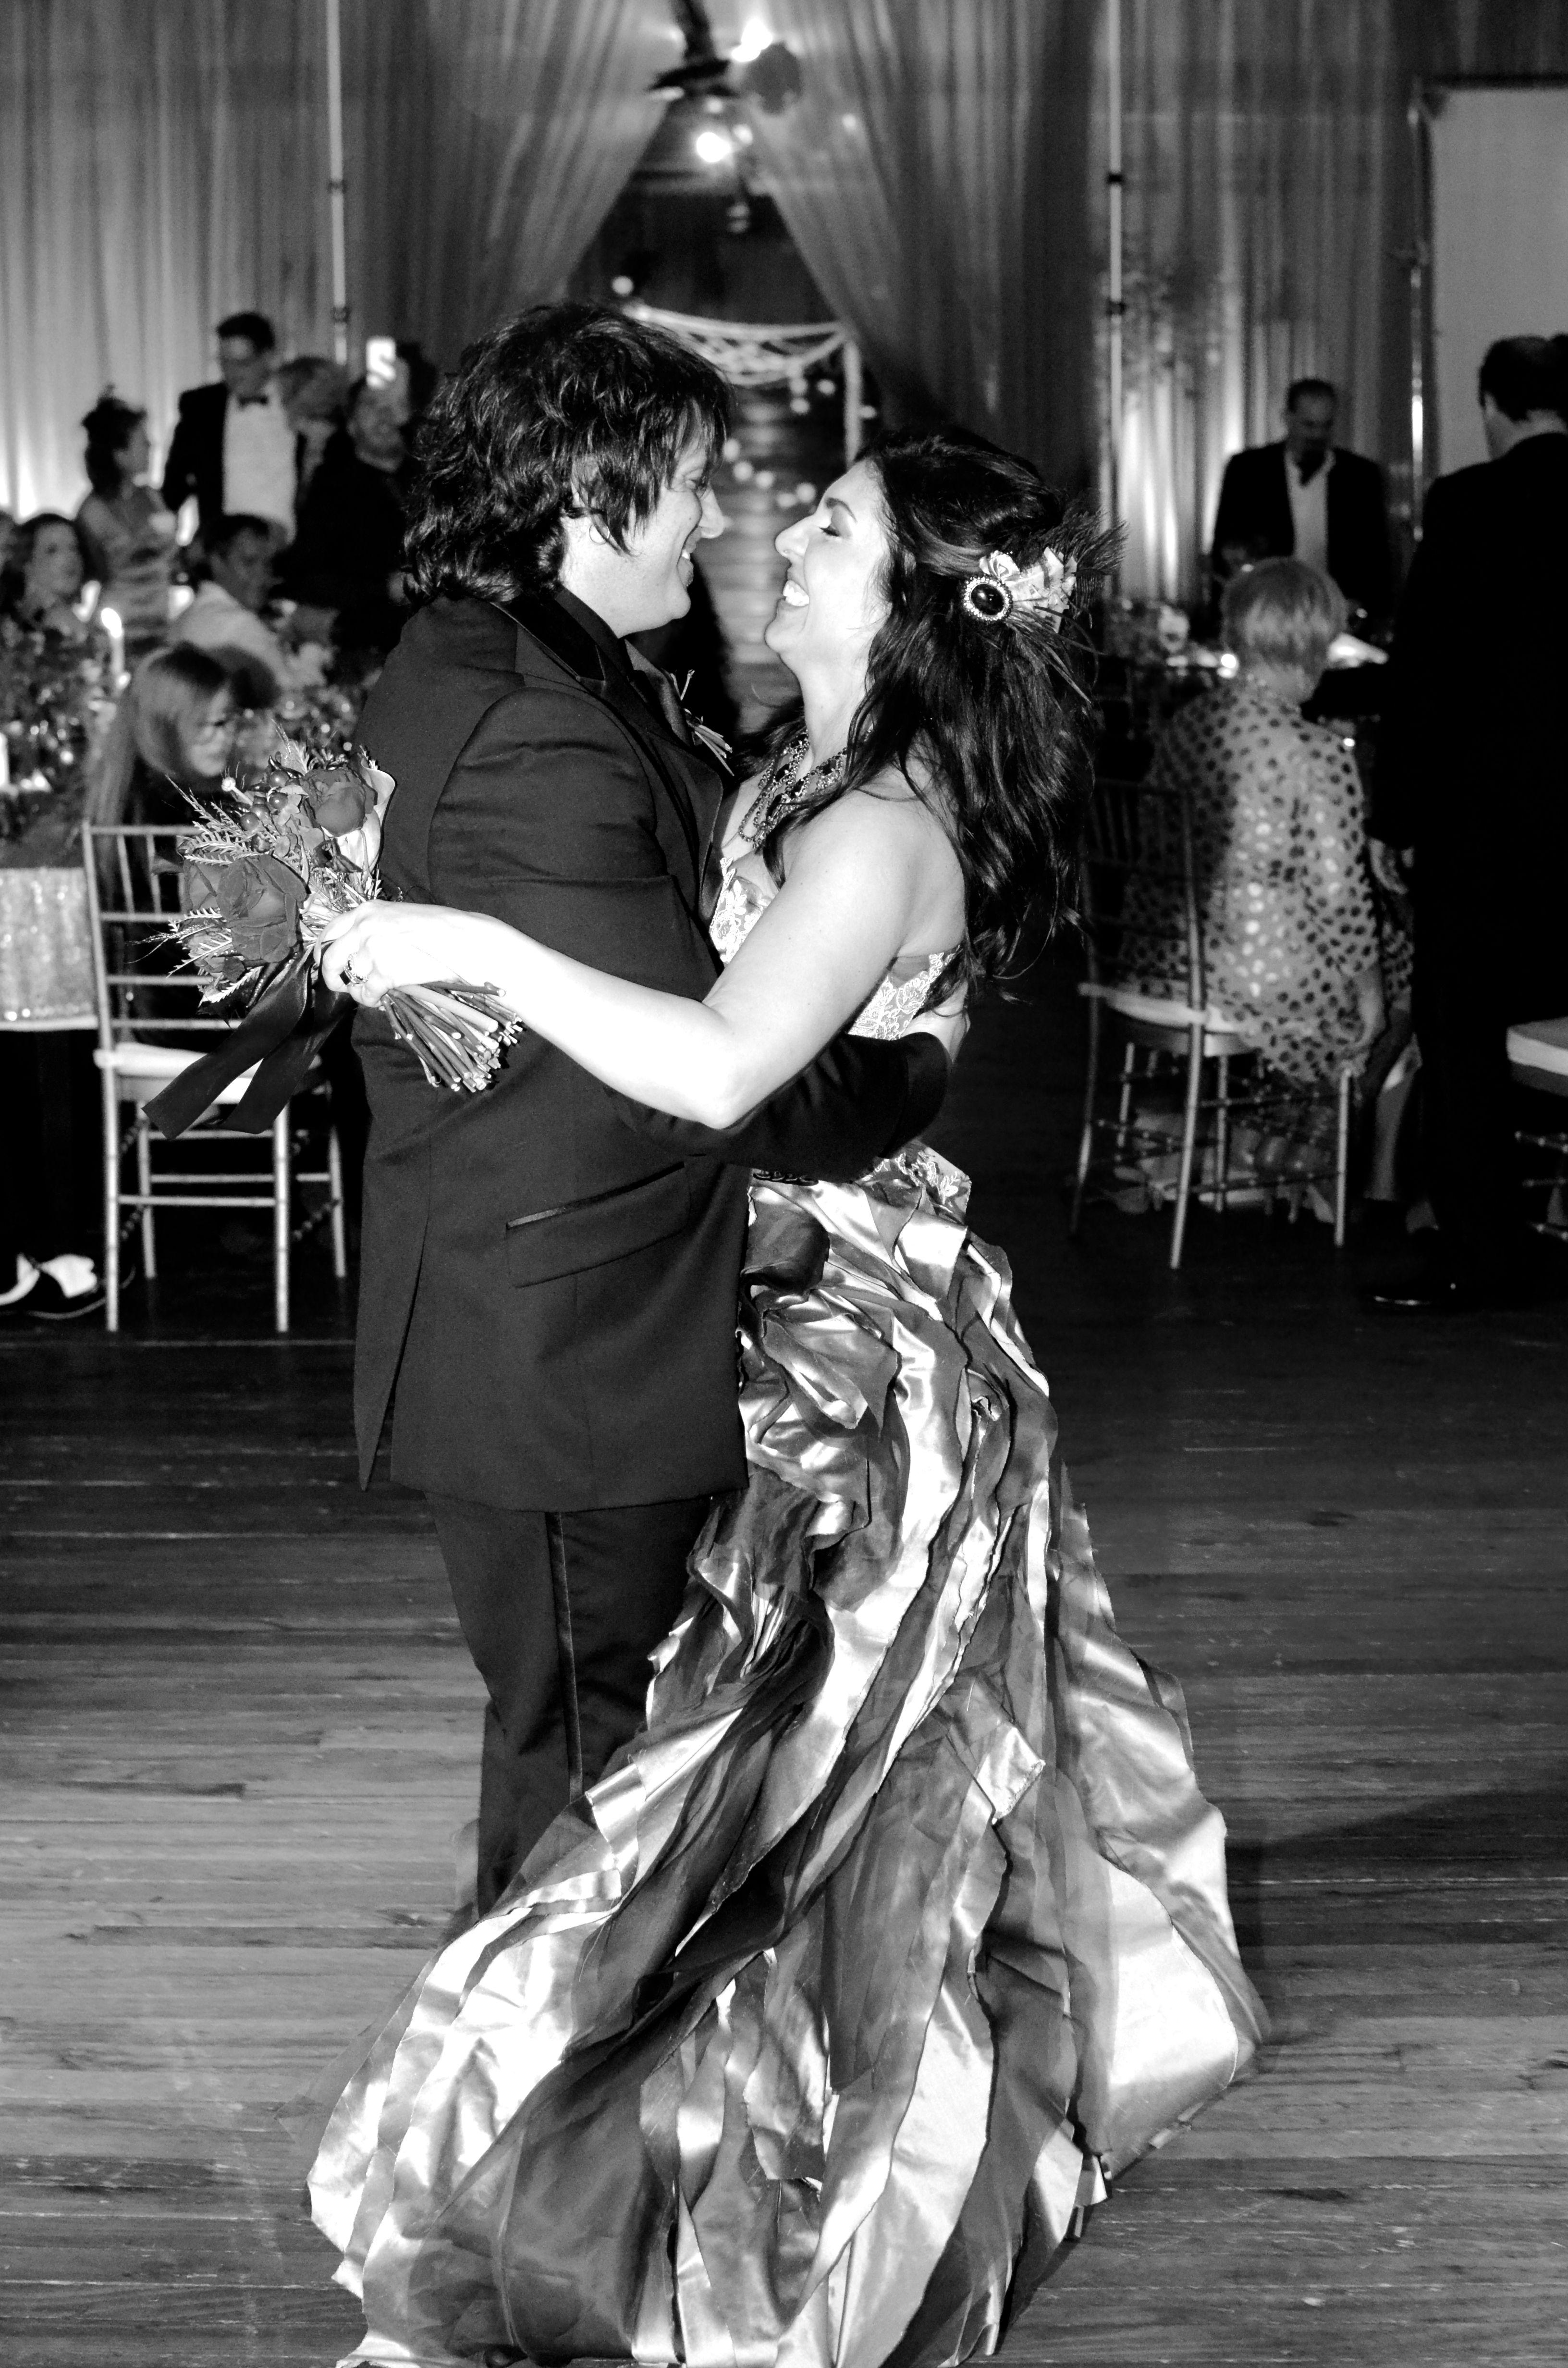 Wedding Photography Taken By: Lahcen Boufedji www.lahcenboufedji.com Atlanta, Ga  404-990-1807